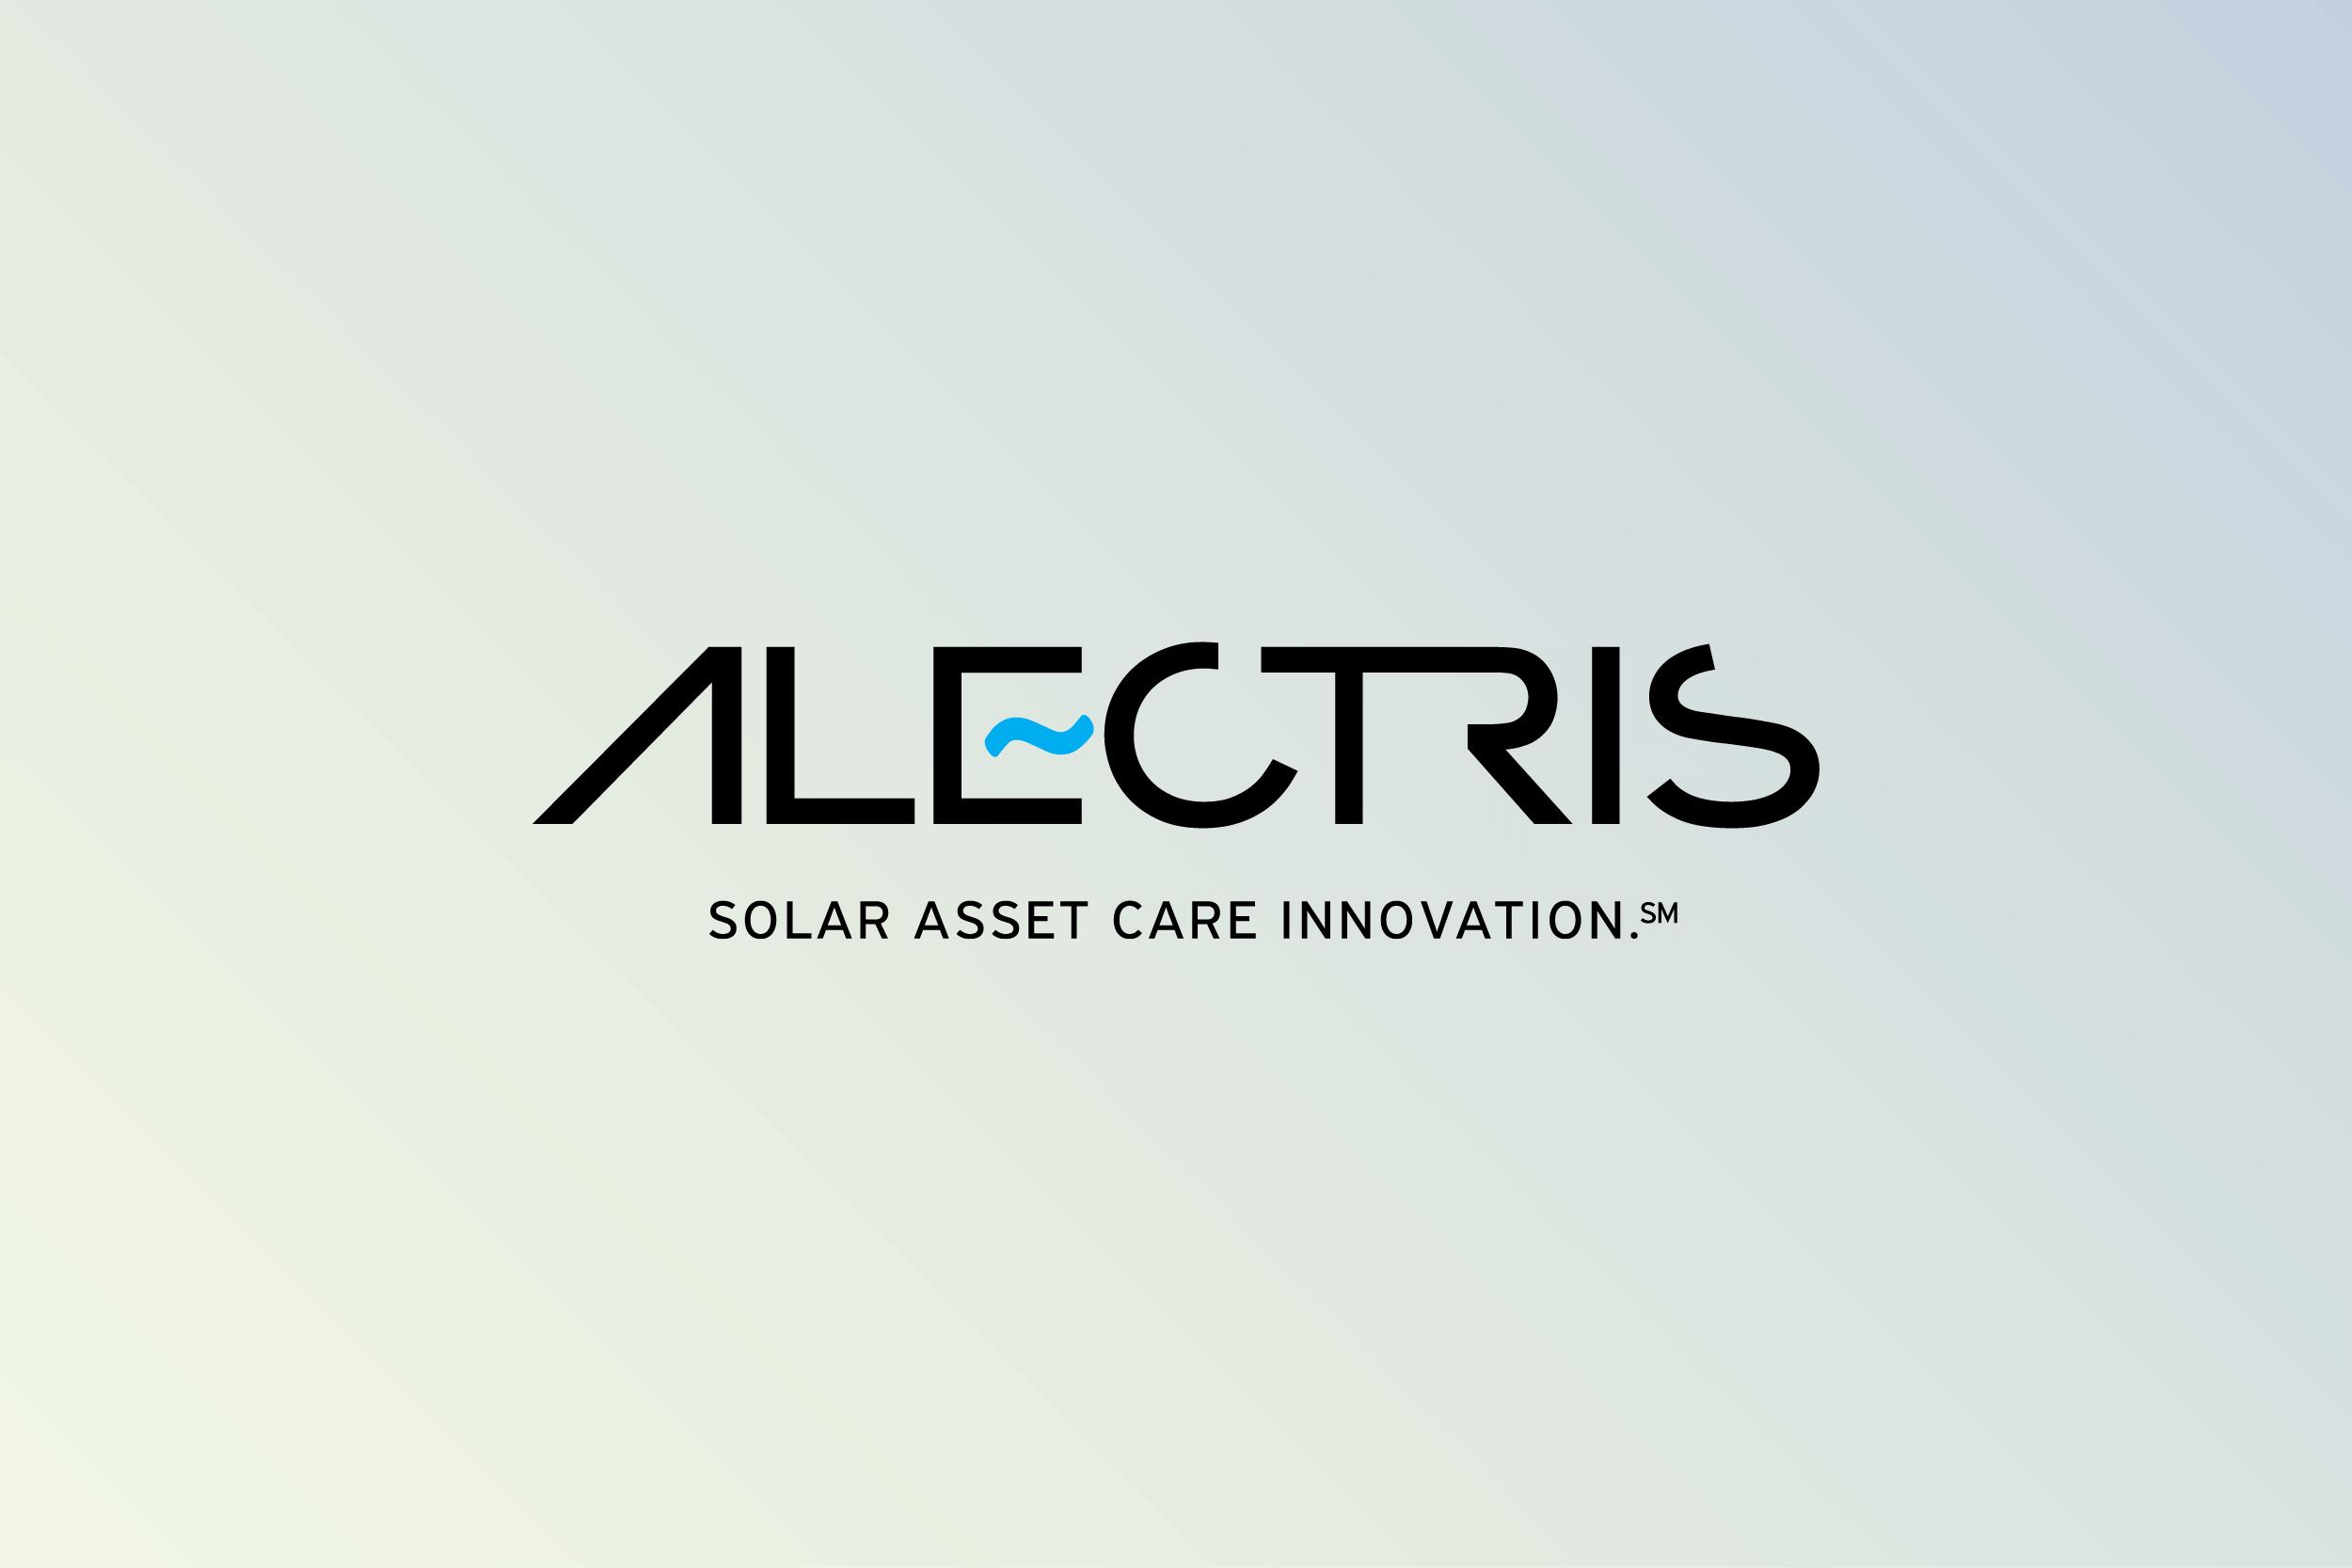 Alectris logo